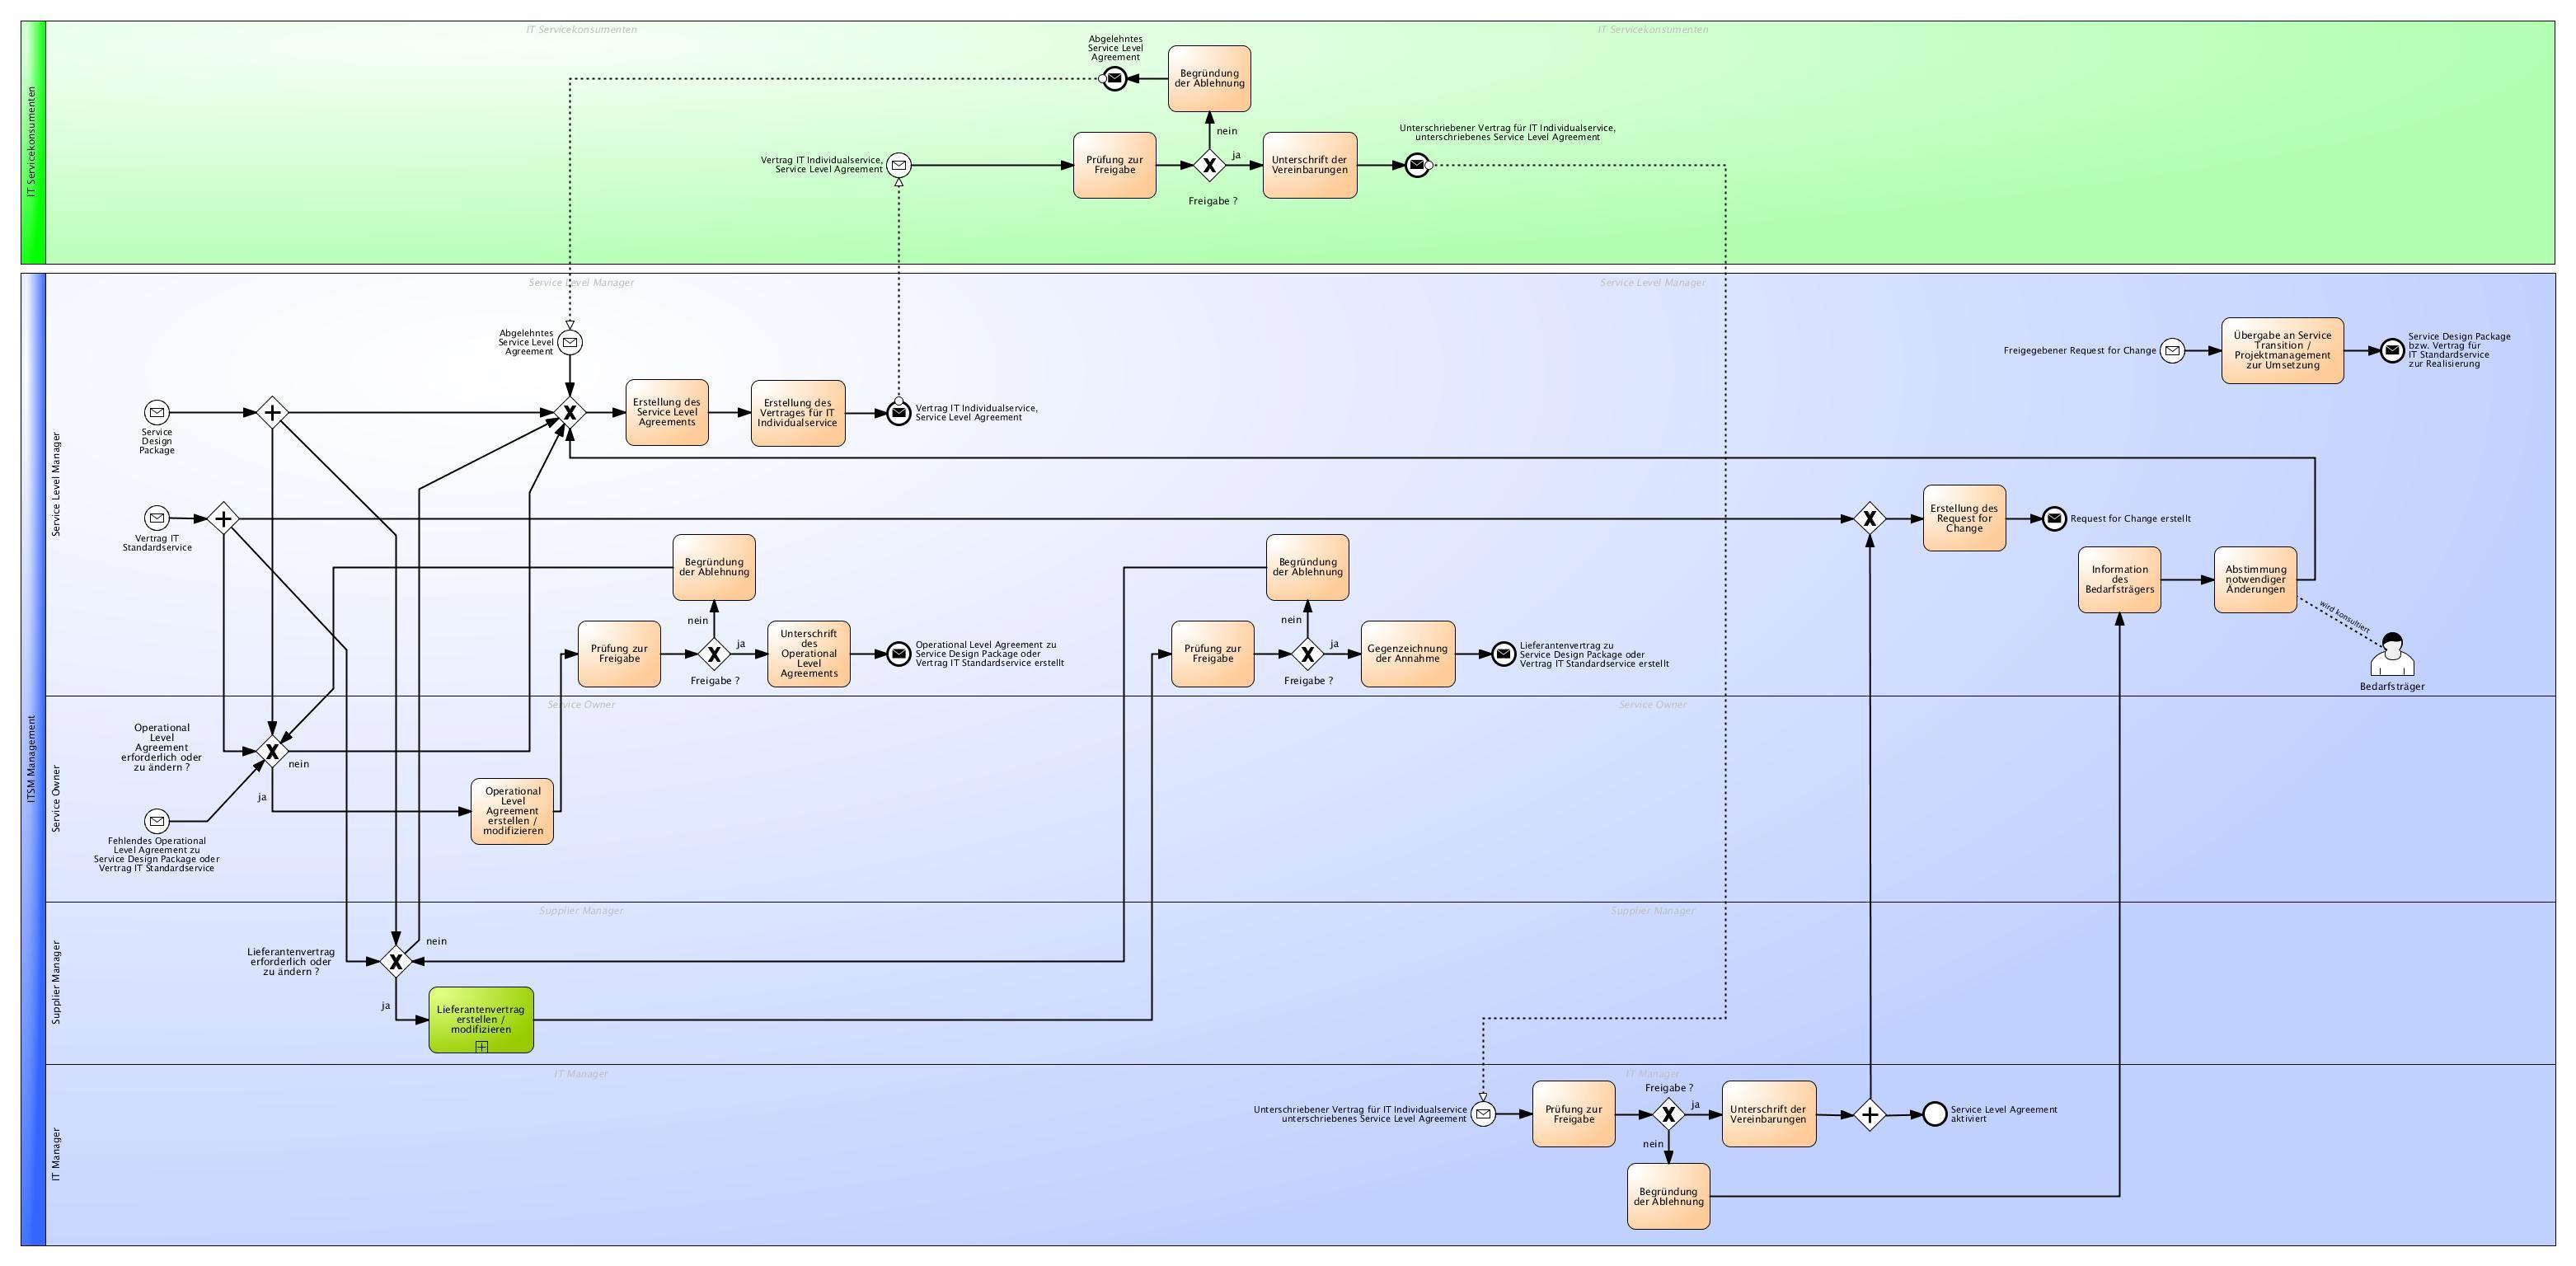 Leseprobe - Prozessdokumentation des Service Design gemäß ITIL® 2011